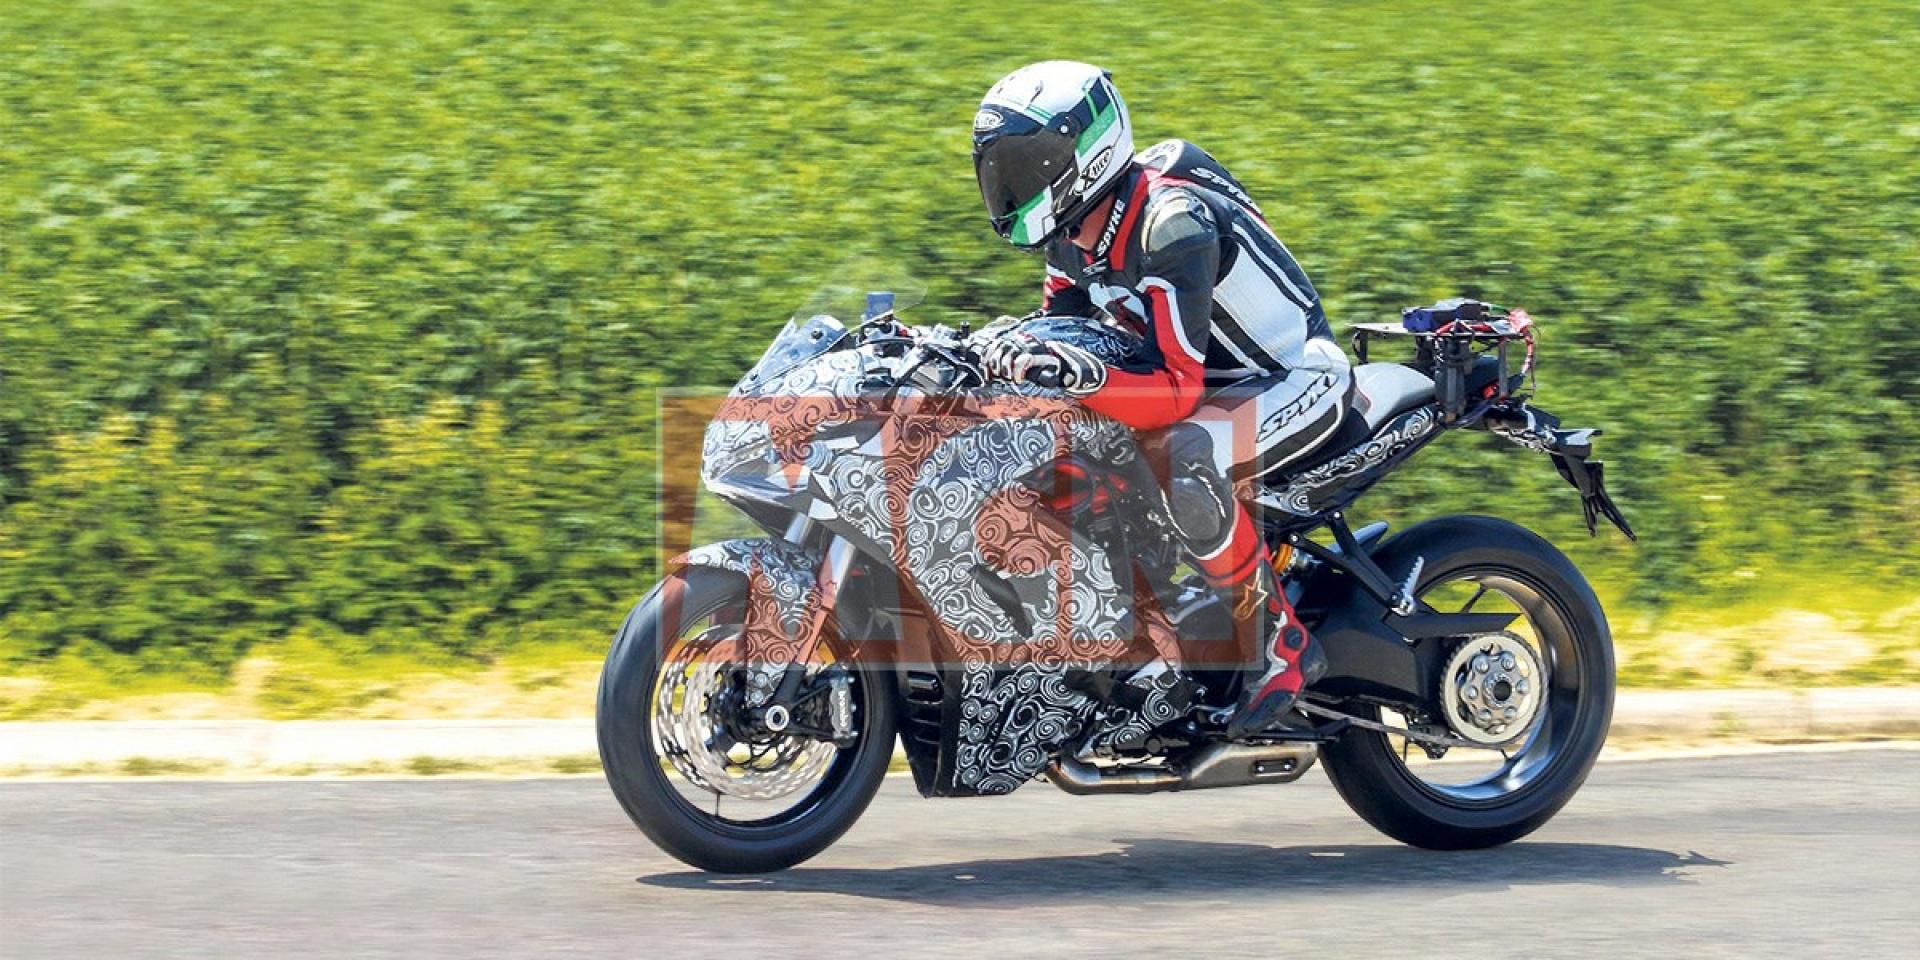 捕獲Ducati SuperSport939測試車